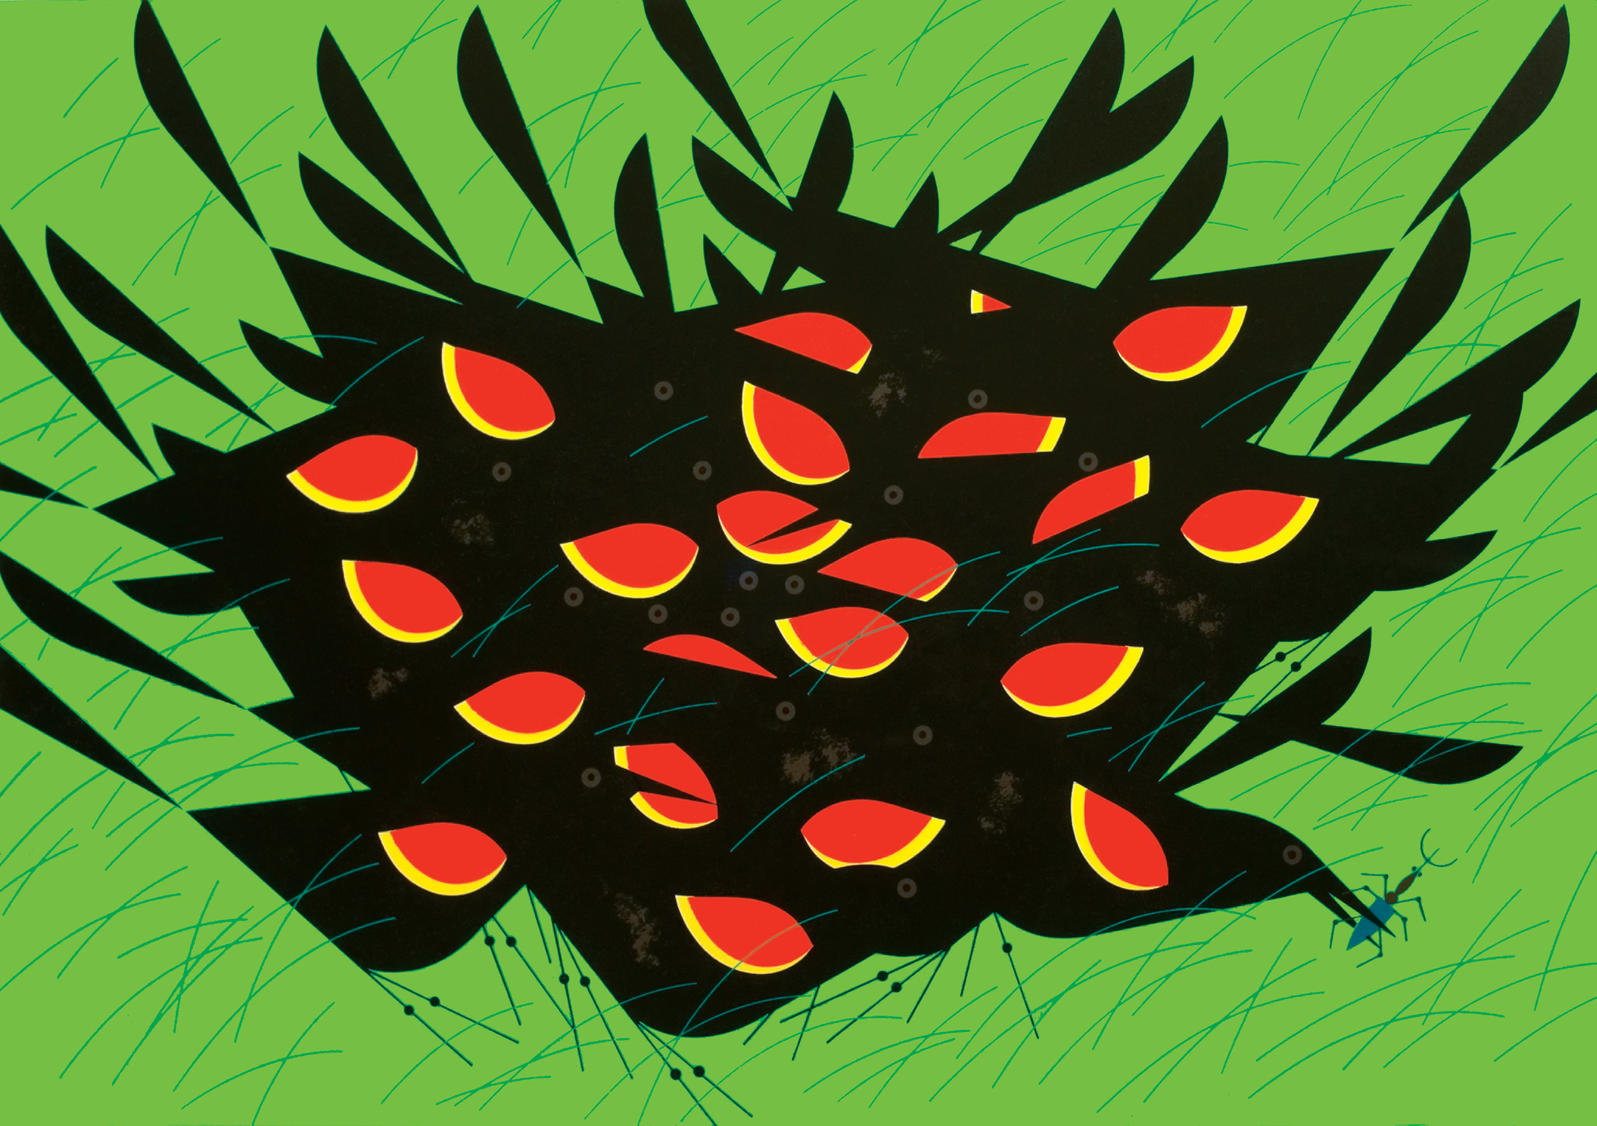 Red-winged blackbirds, 1960 Charley Harper